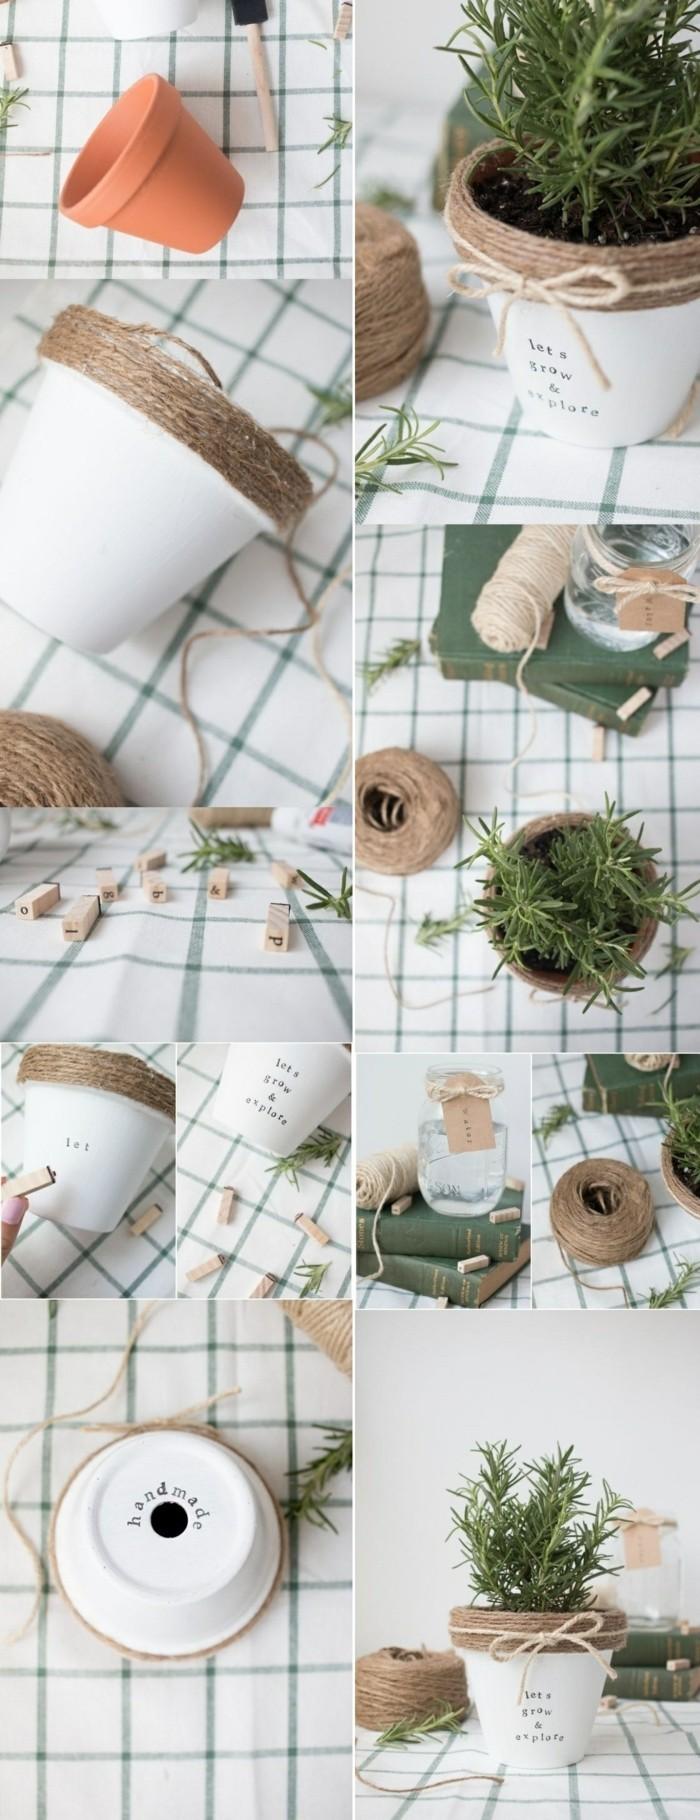 kreatives-basteln-blumentopf-gruene-pflanze-dekoration